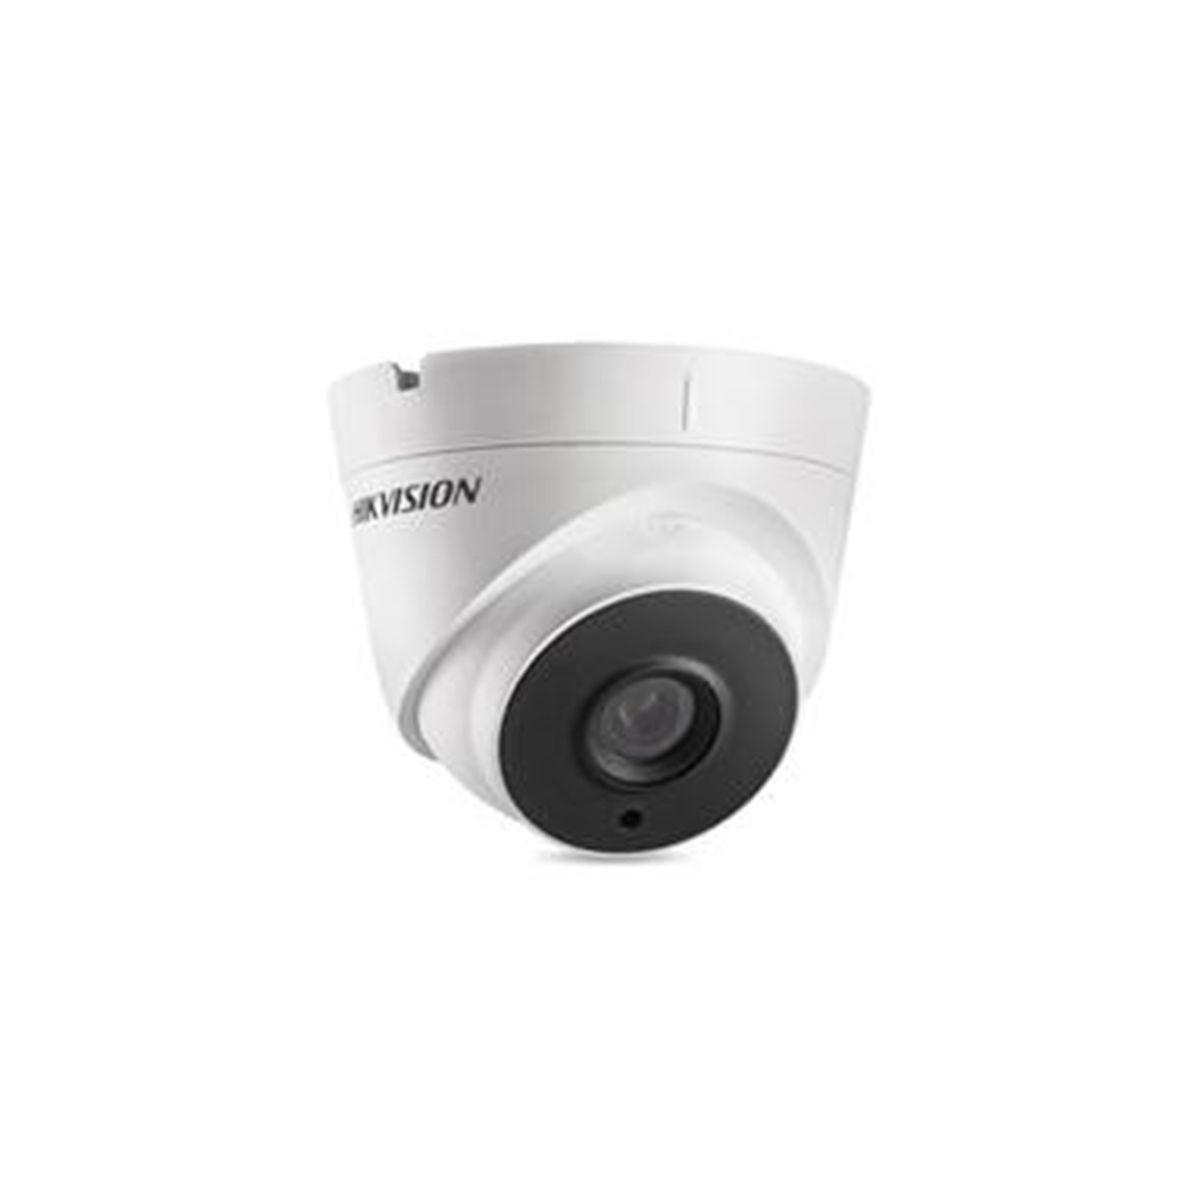 Cámara Hikvision Turbo HD Tipo domo DS-2CE56F1T-IT3